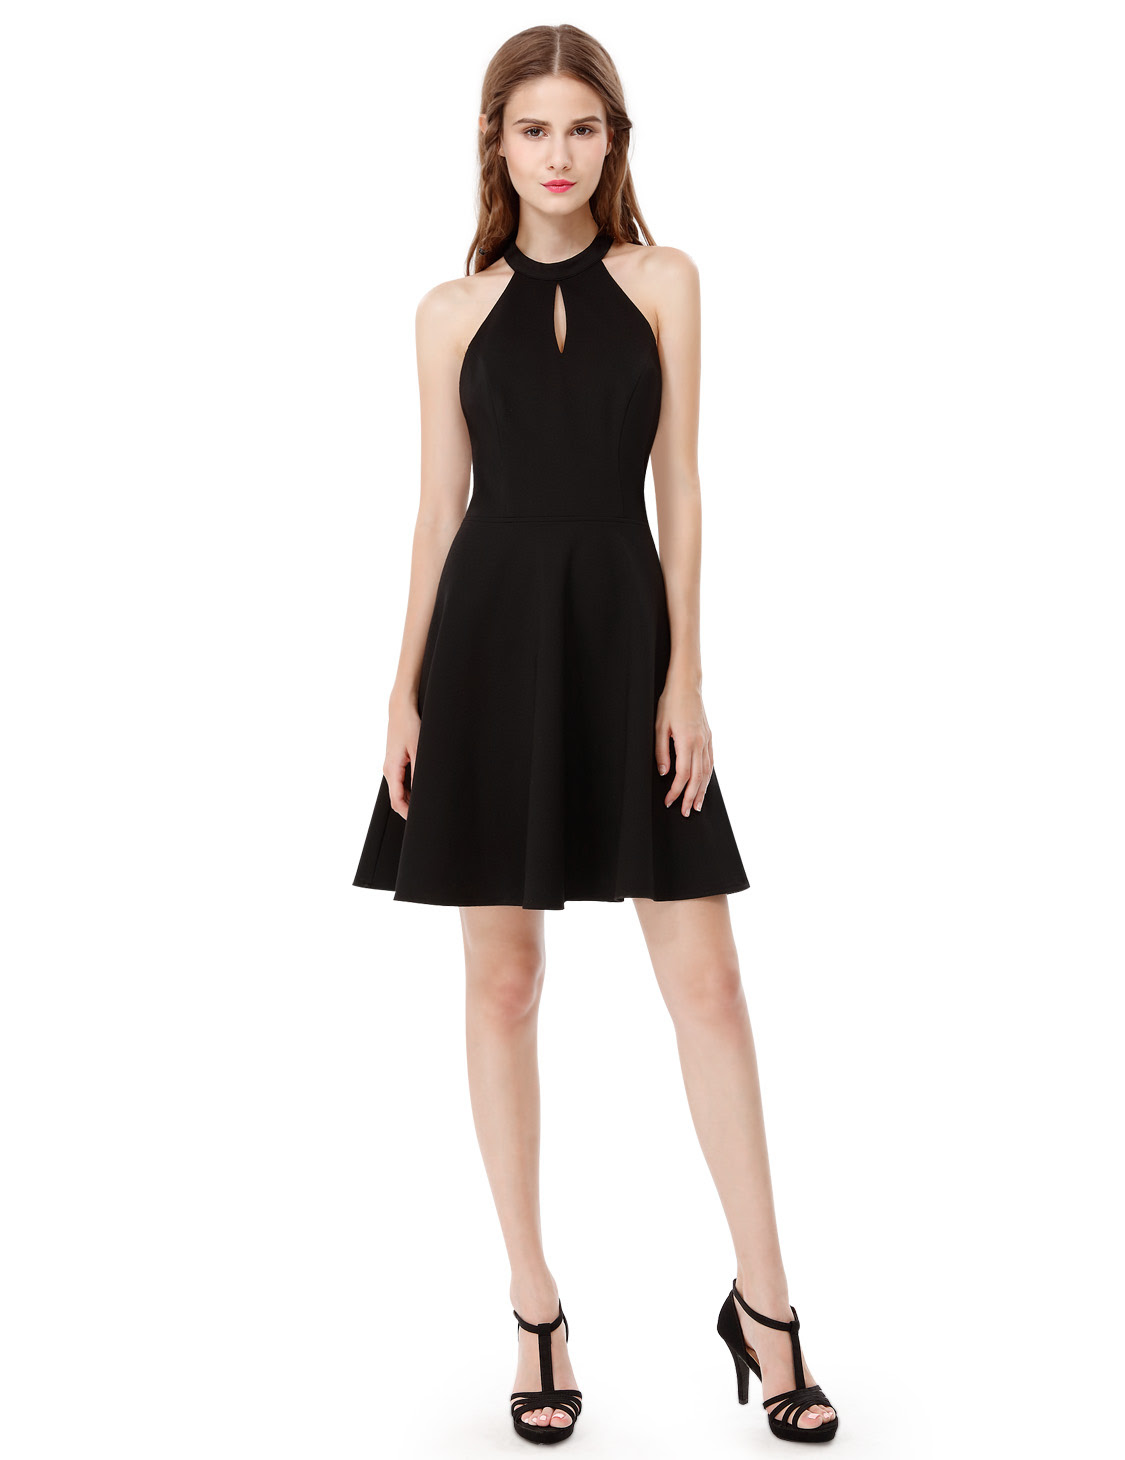 women's short black sexy halter sleeveless casual summer